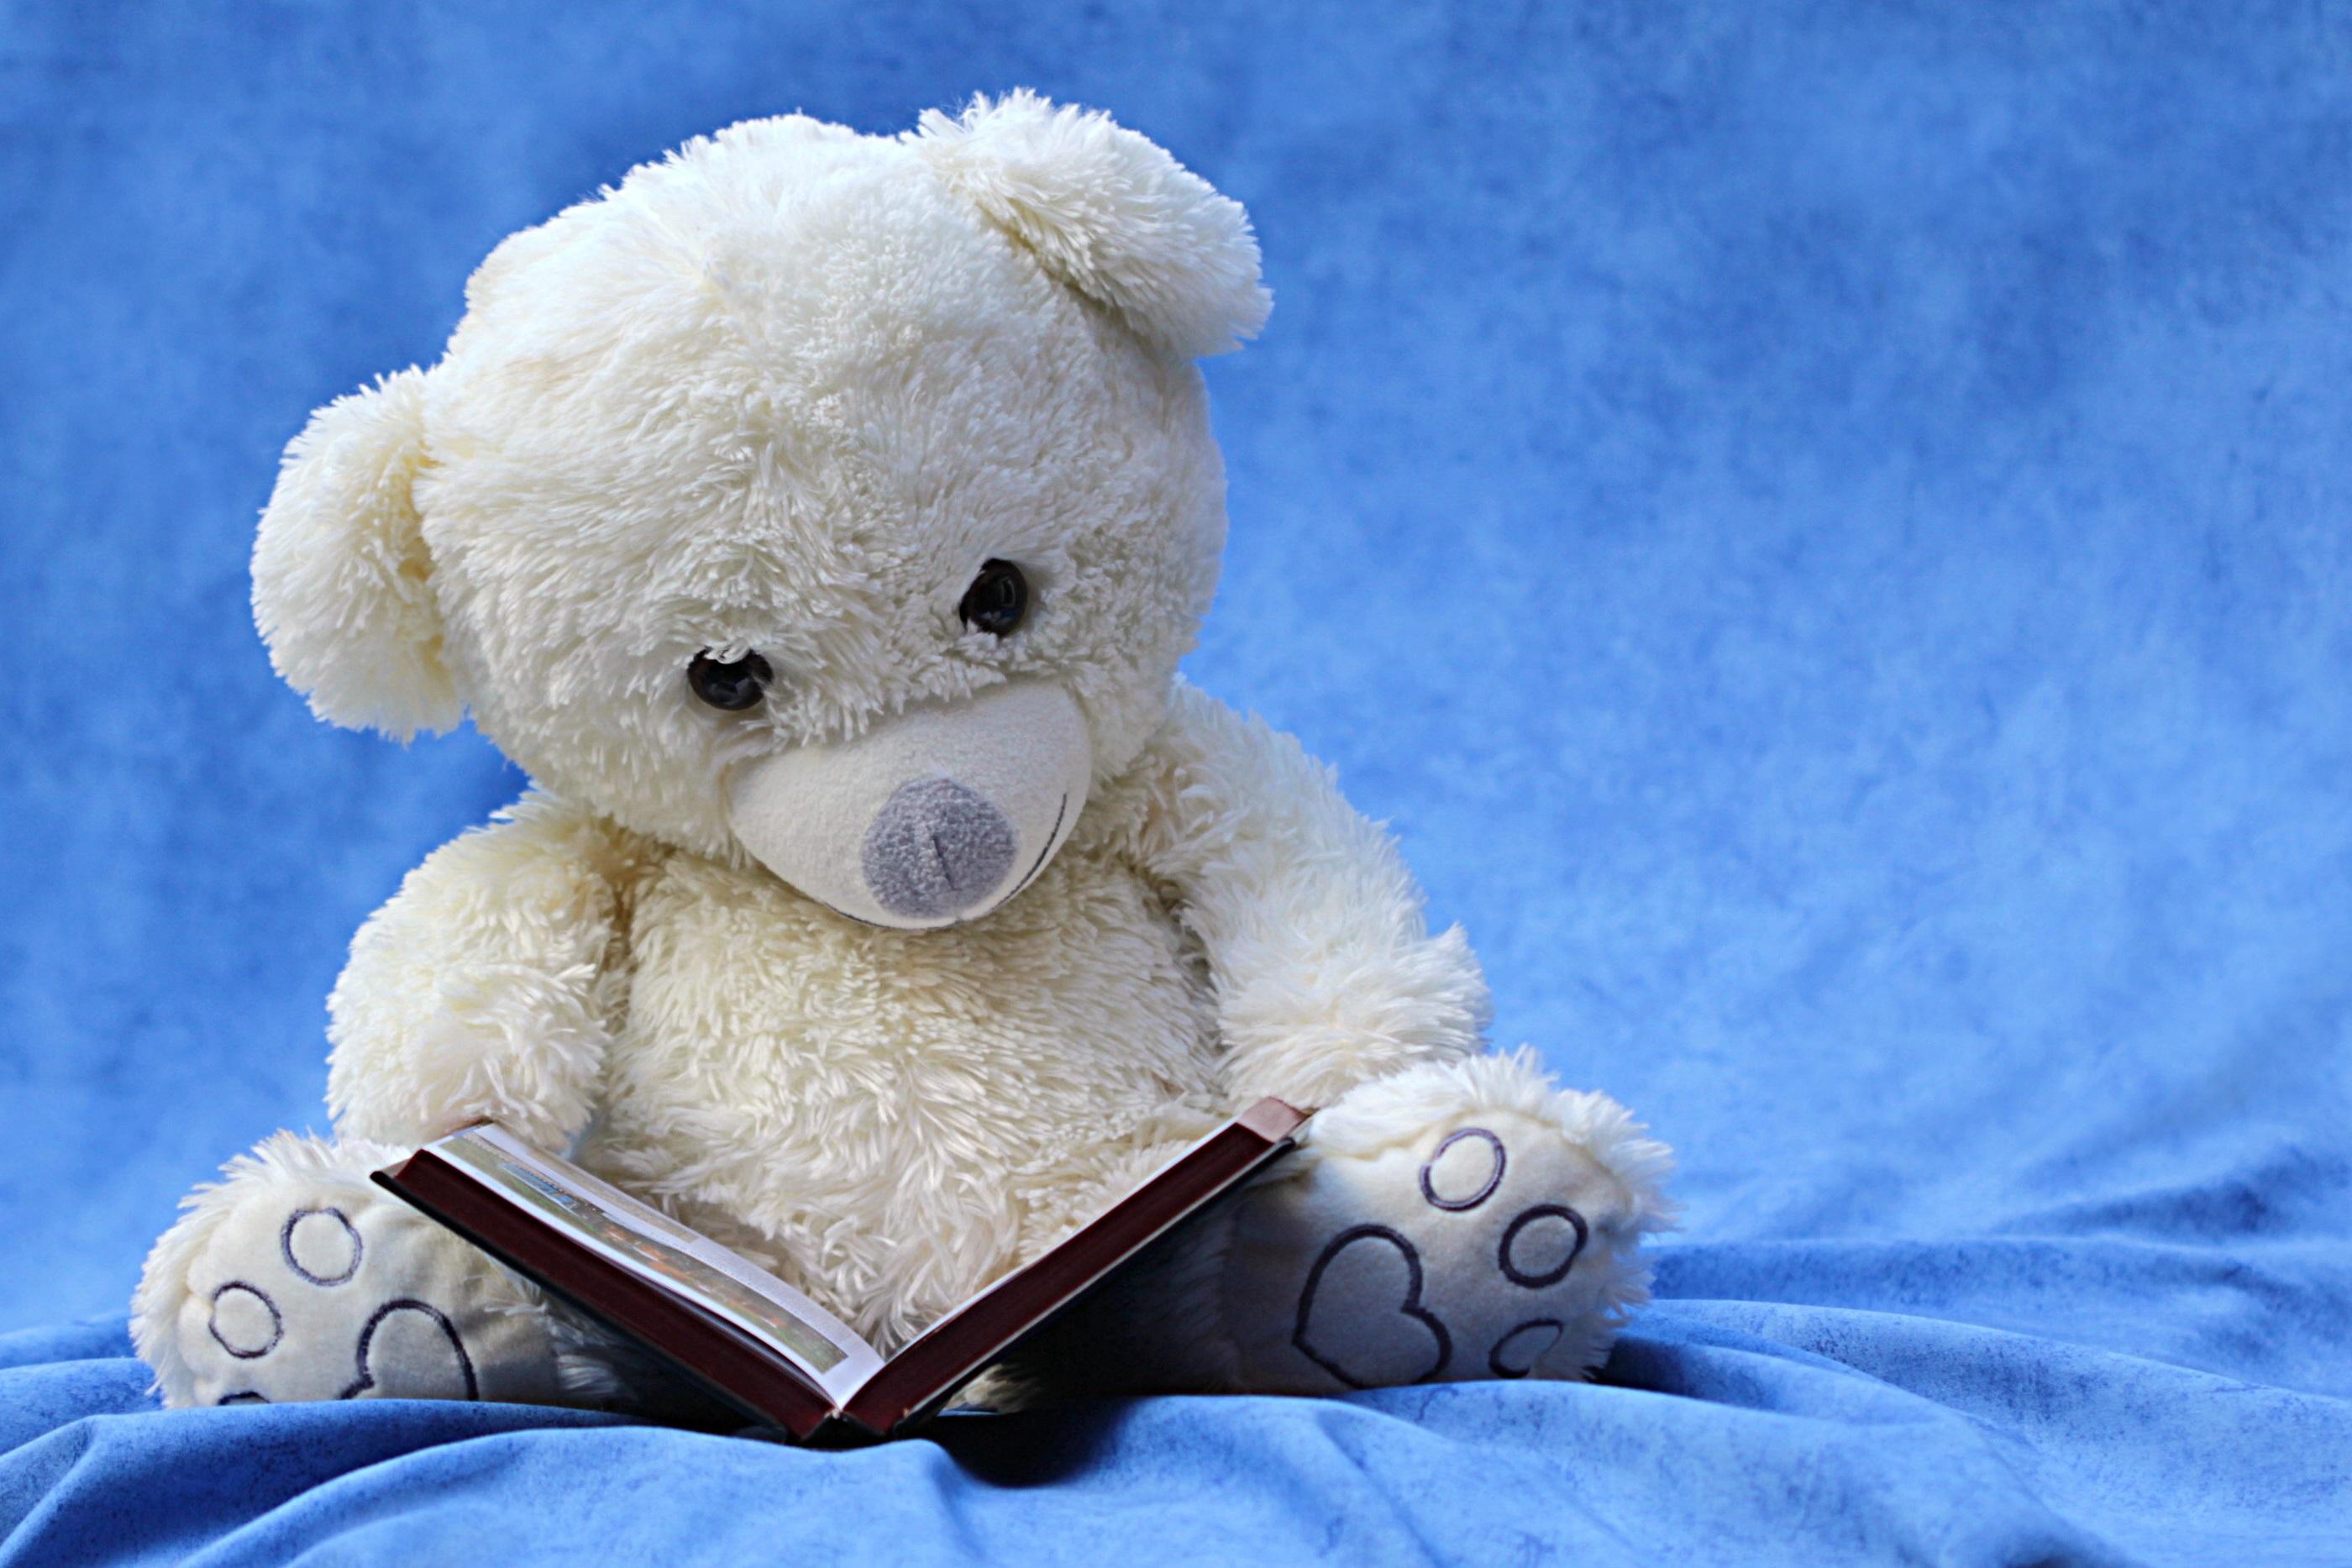 White stuffed teddy bear reading full hd wallpaper and background man made stuffed animal teddy bear toy book still life blue wallpaper altavistaventures Images